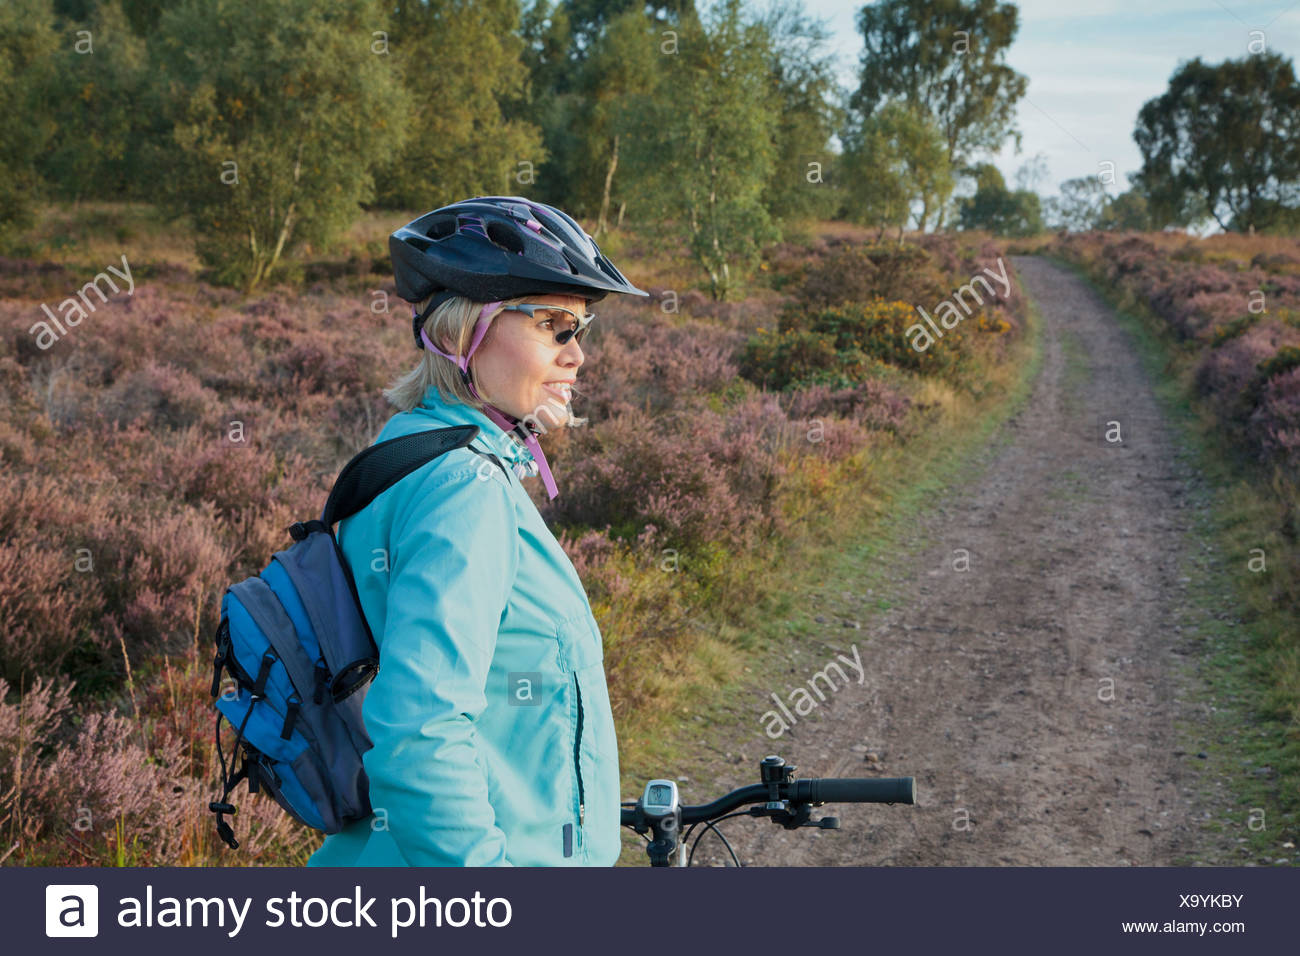 Woman mountain biking on dirt path - Stock Image